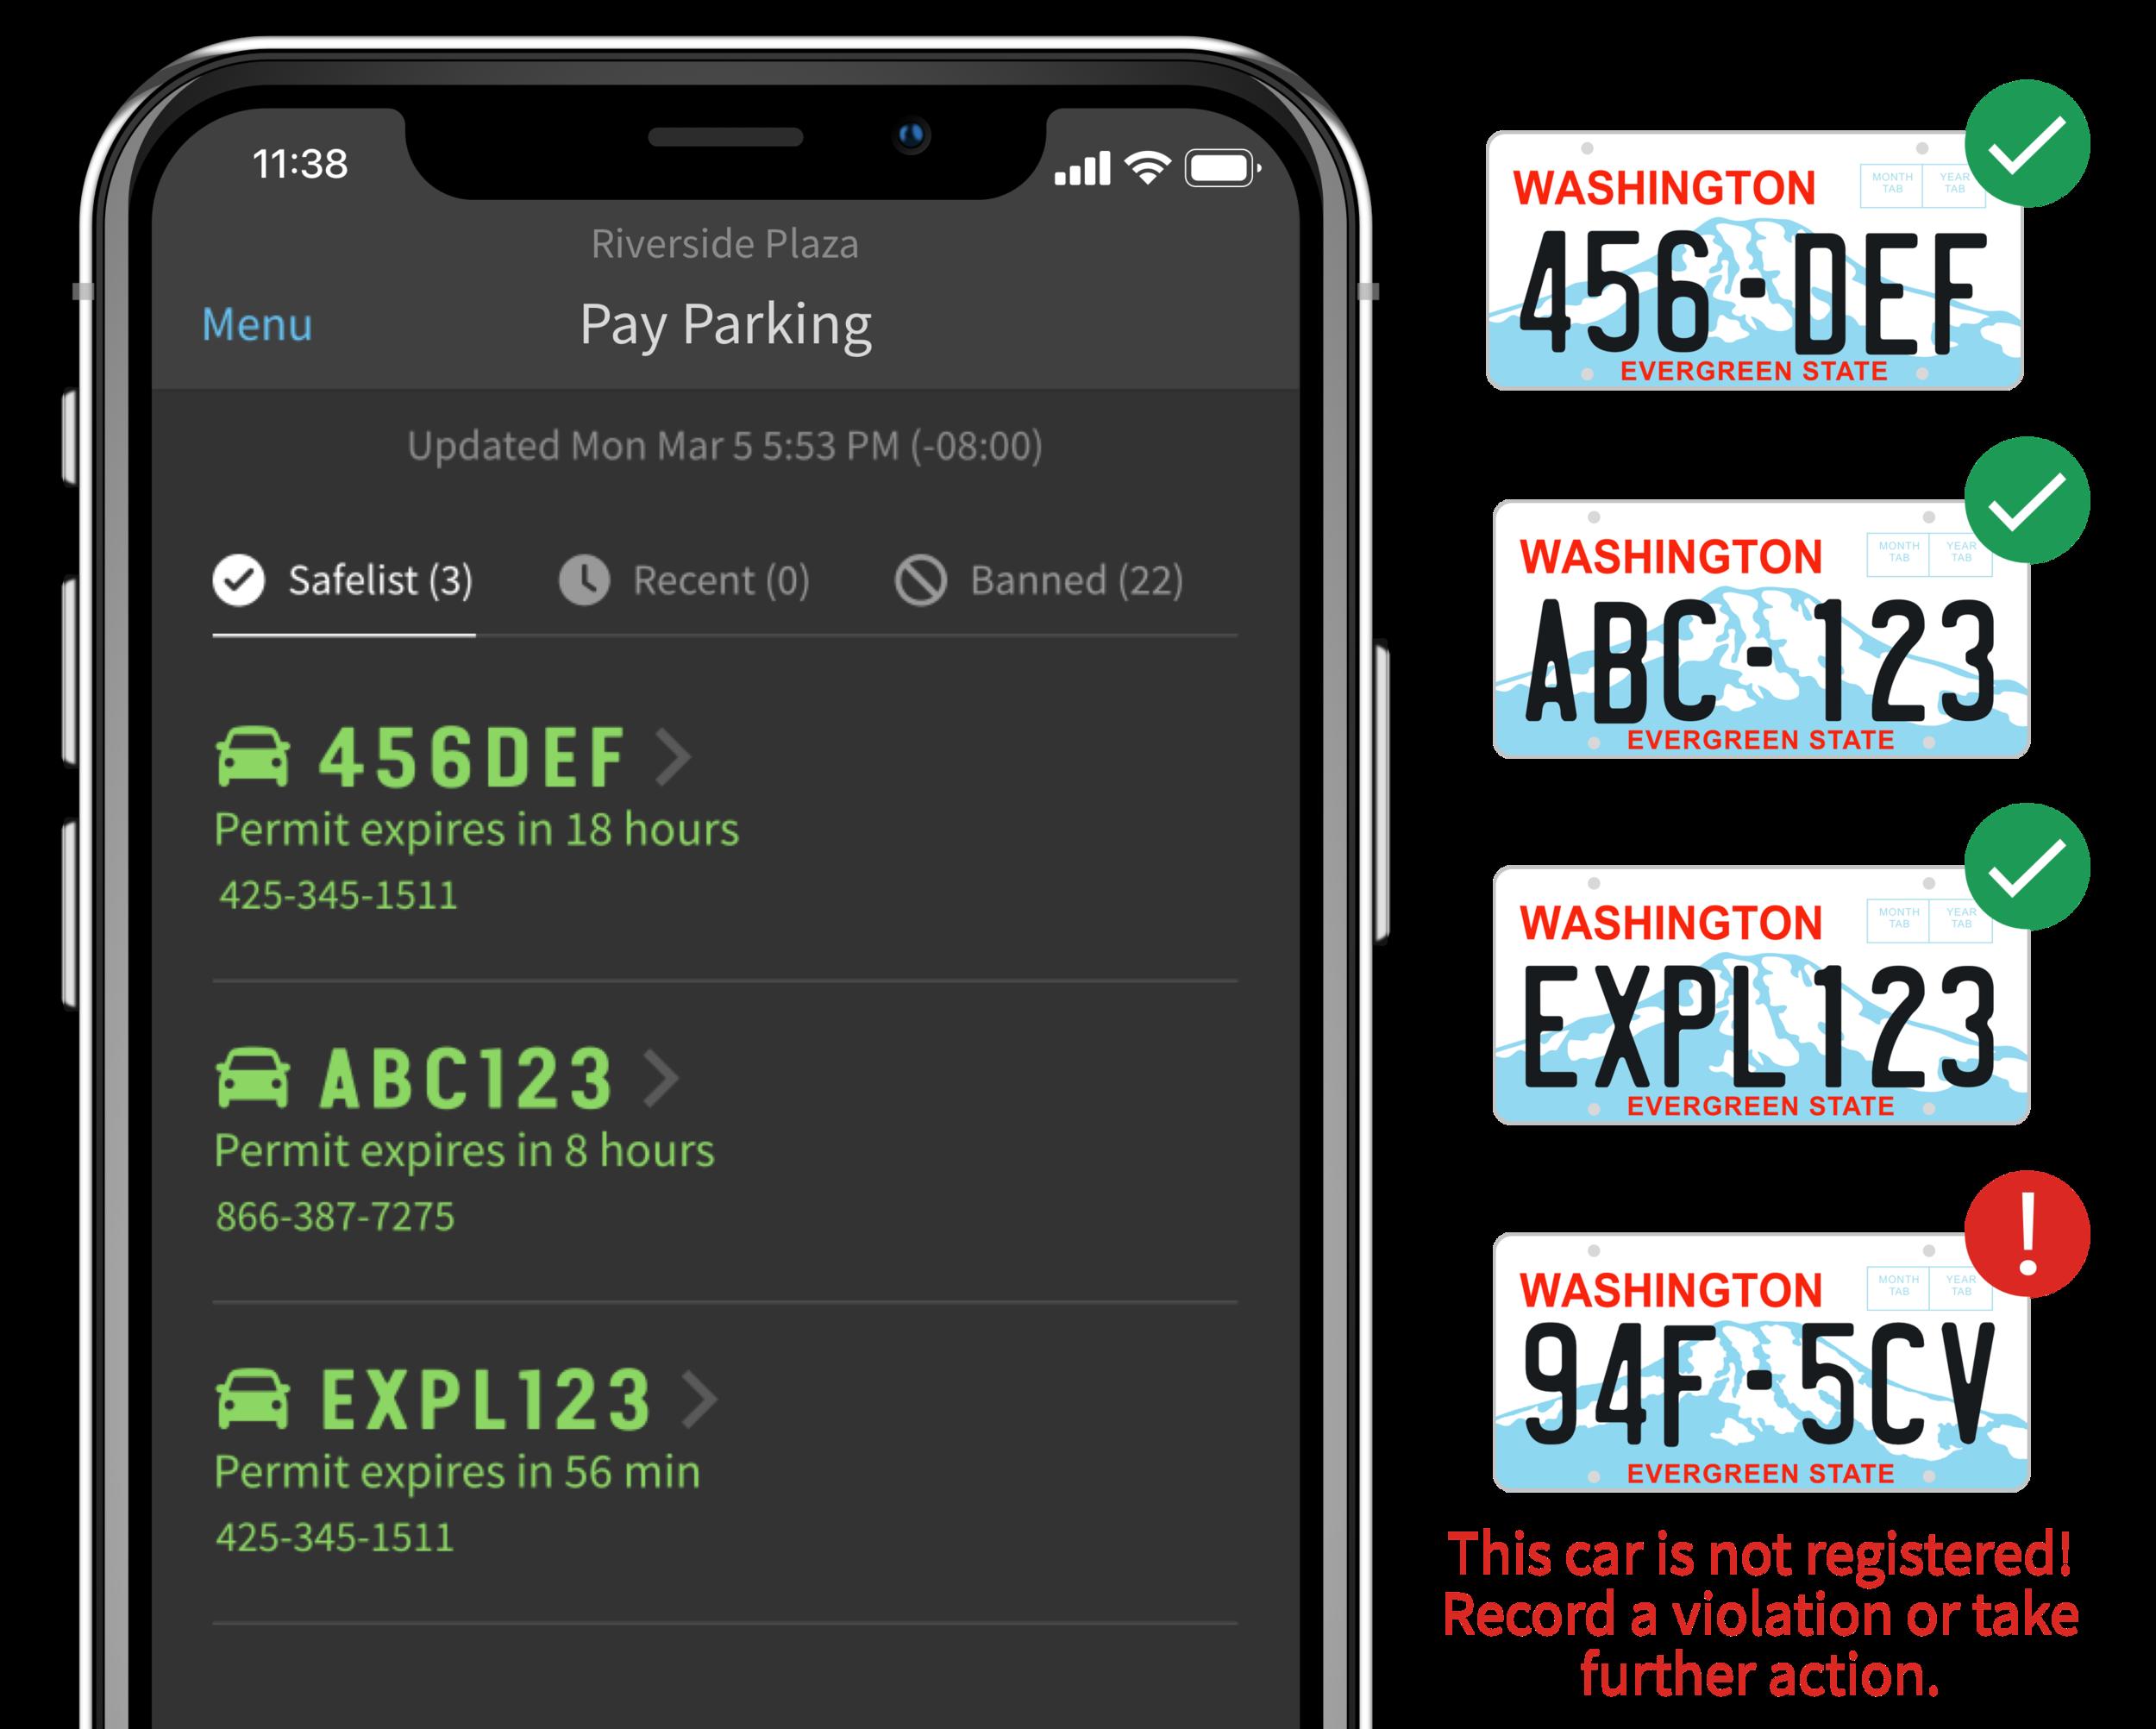 safe-list-pay-parking.png